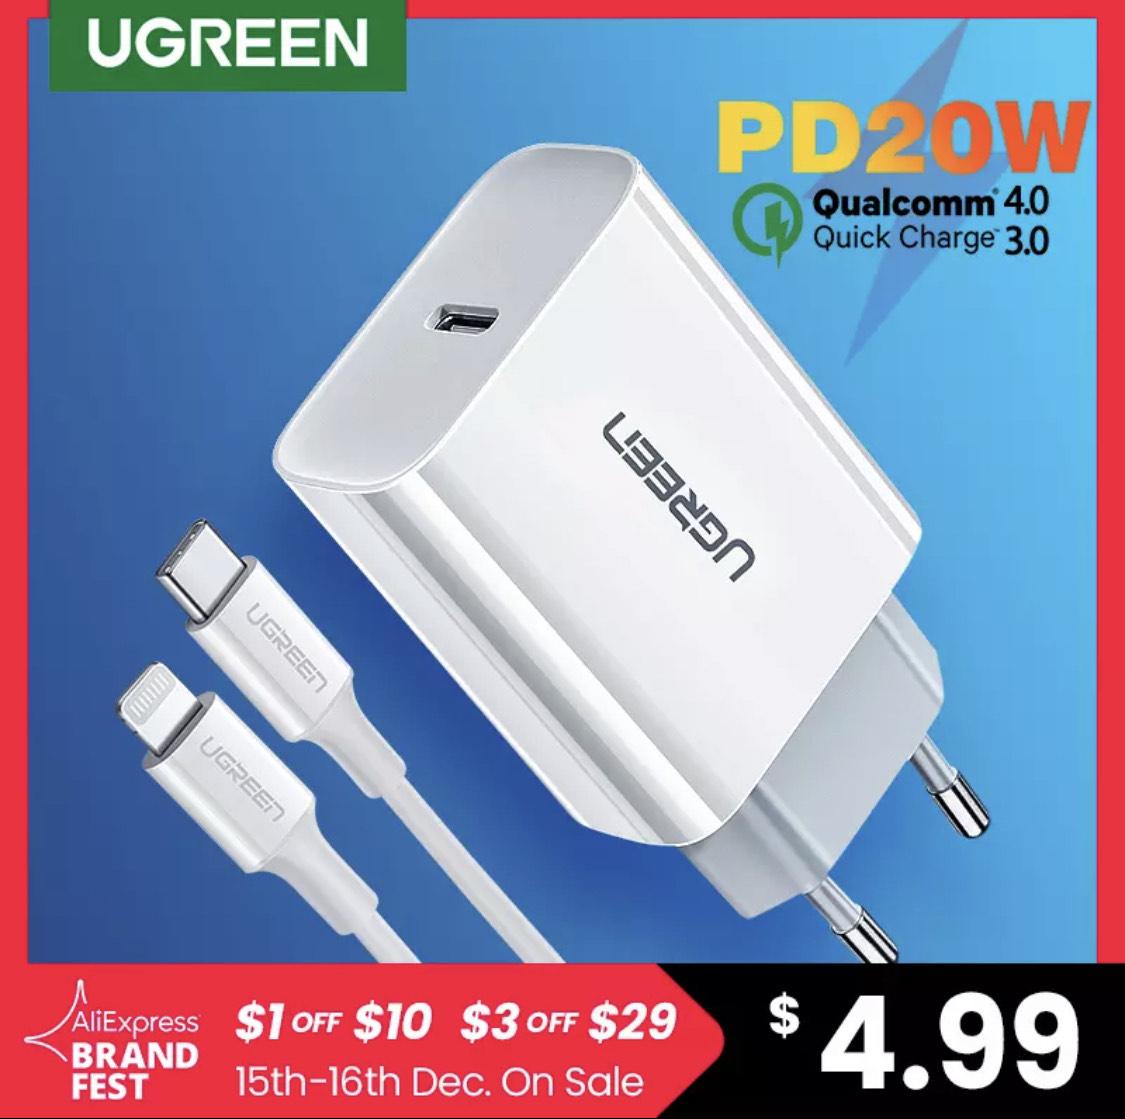 Ugreen-cargador rápido tipo C para iPhone, Cargador USB tipo C de 20W, QC4.0